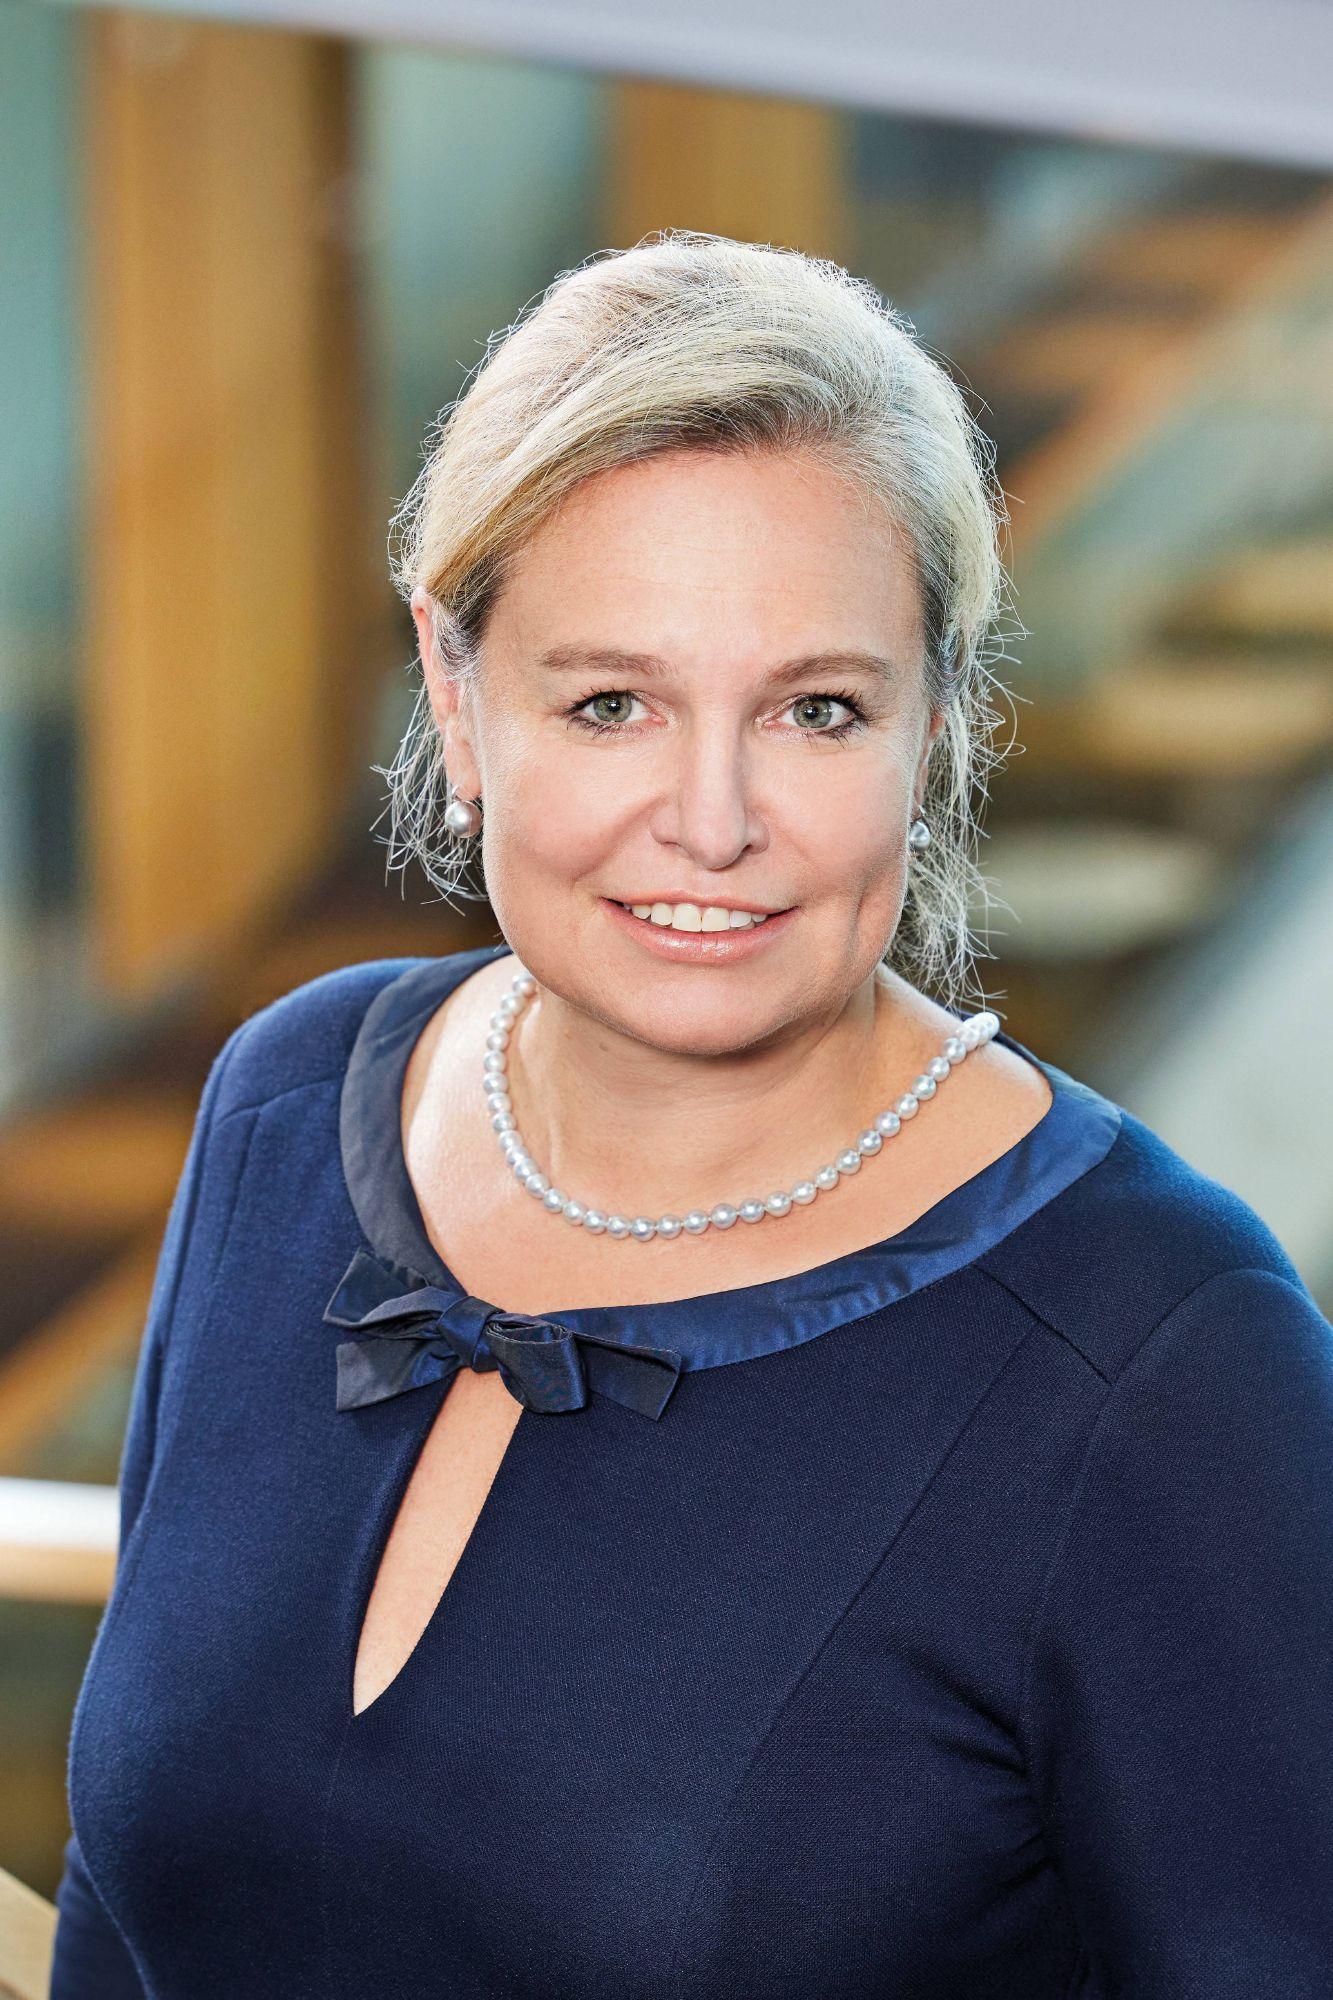 Vorstand-2020-Karoline-Kalb.jpg